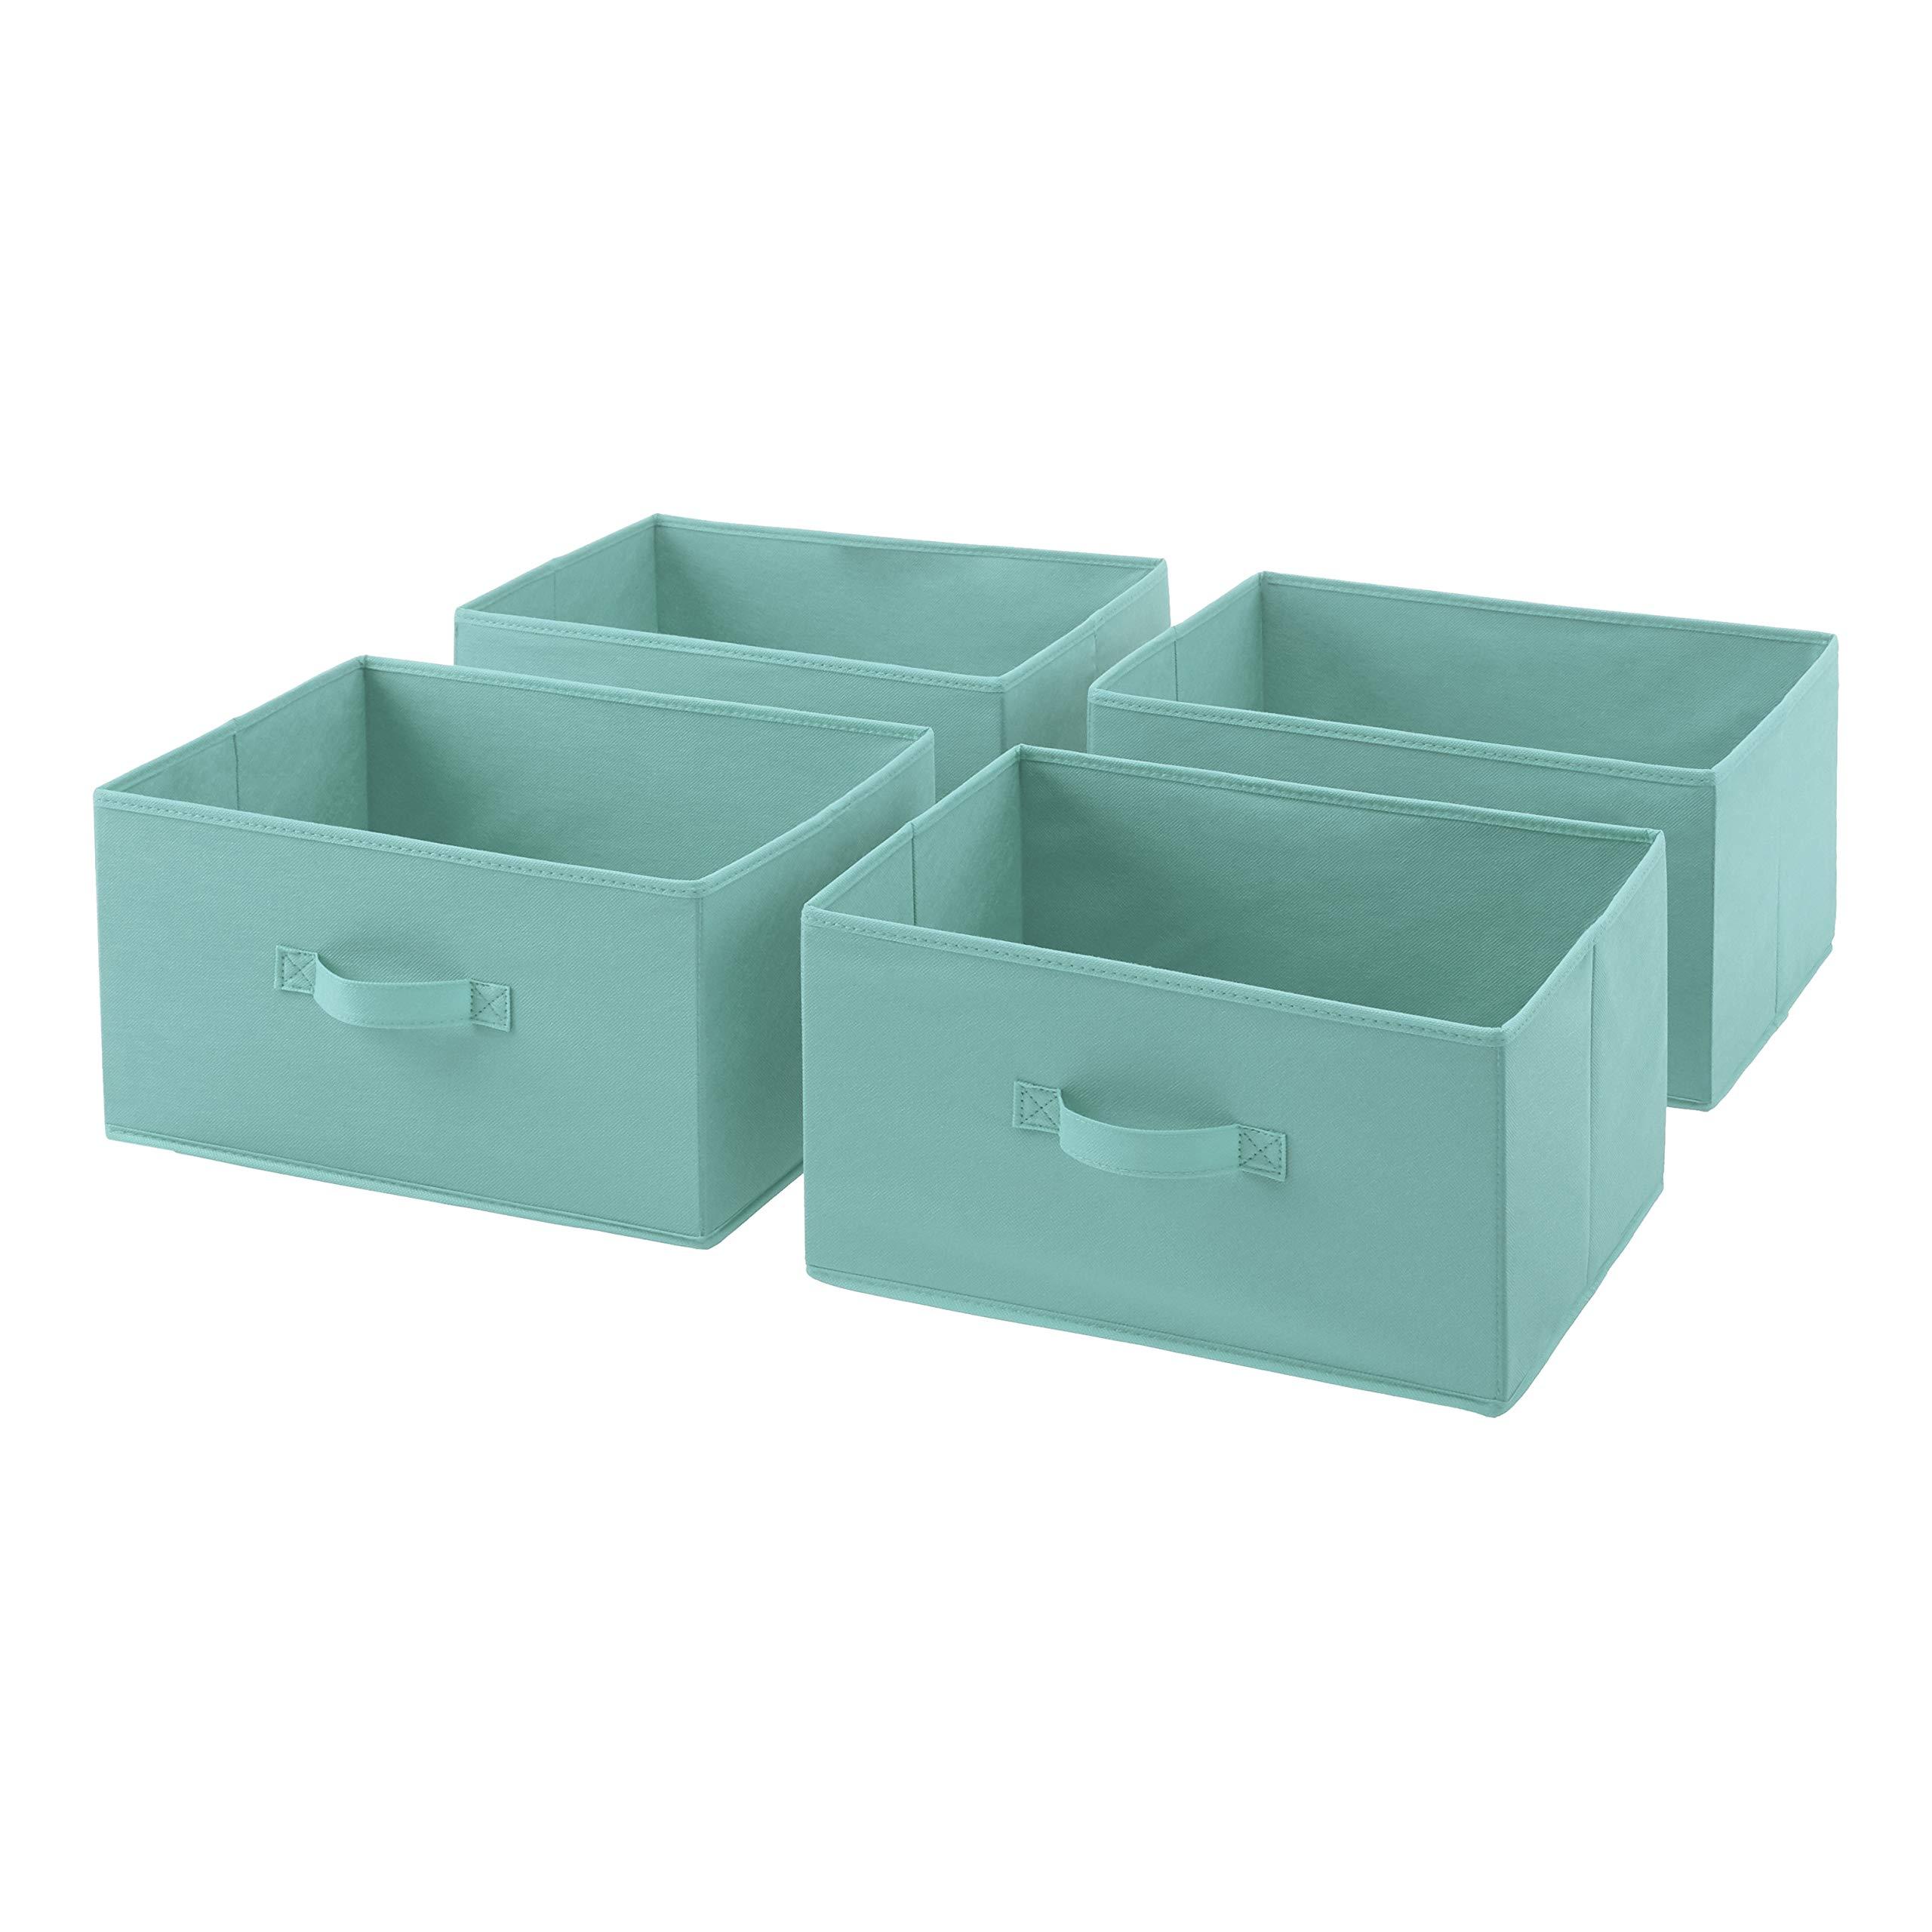 AmazonBasics Fabric 4-Drawer Storage Organizer - Replacement Drawers, Mint Green